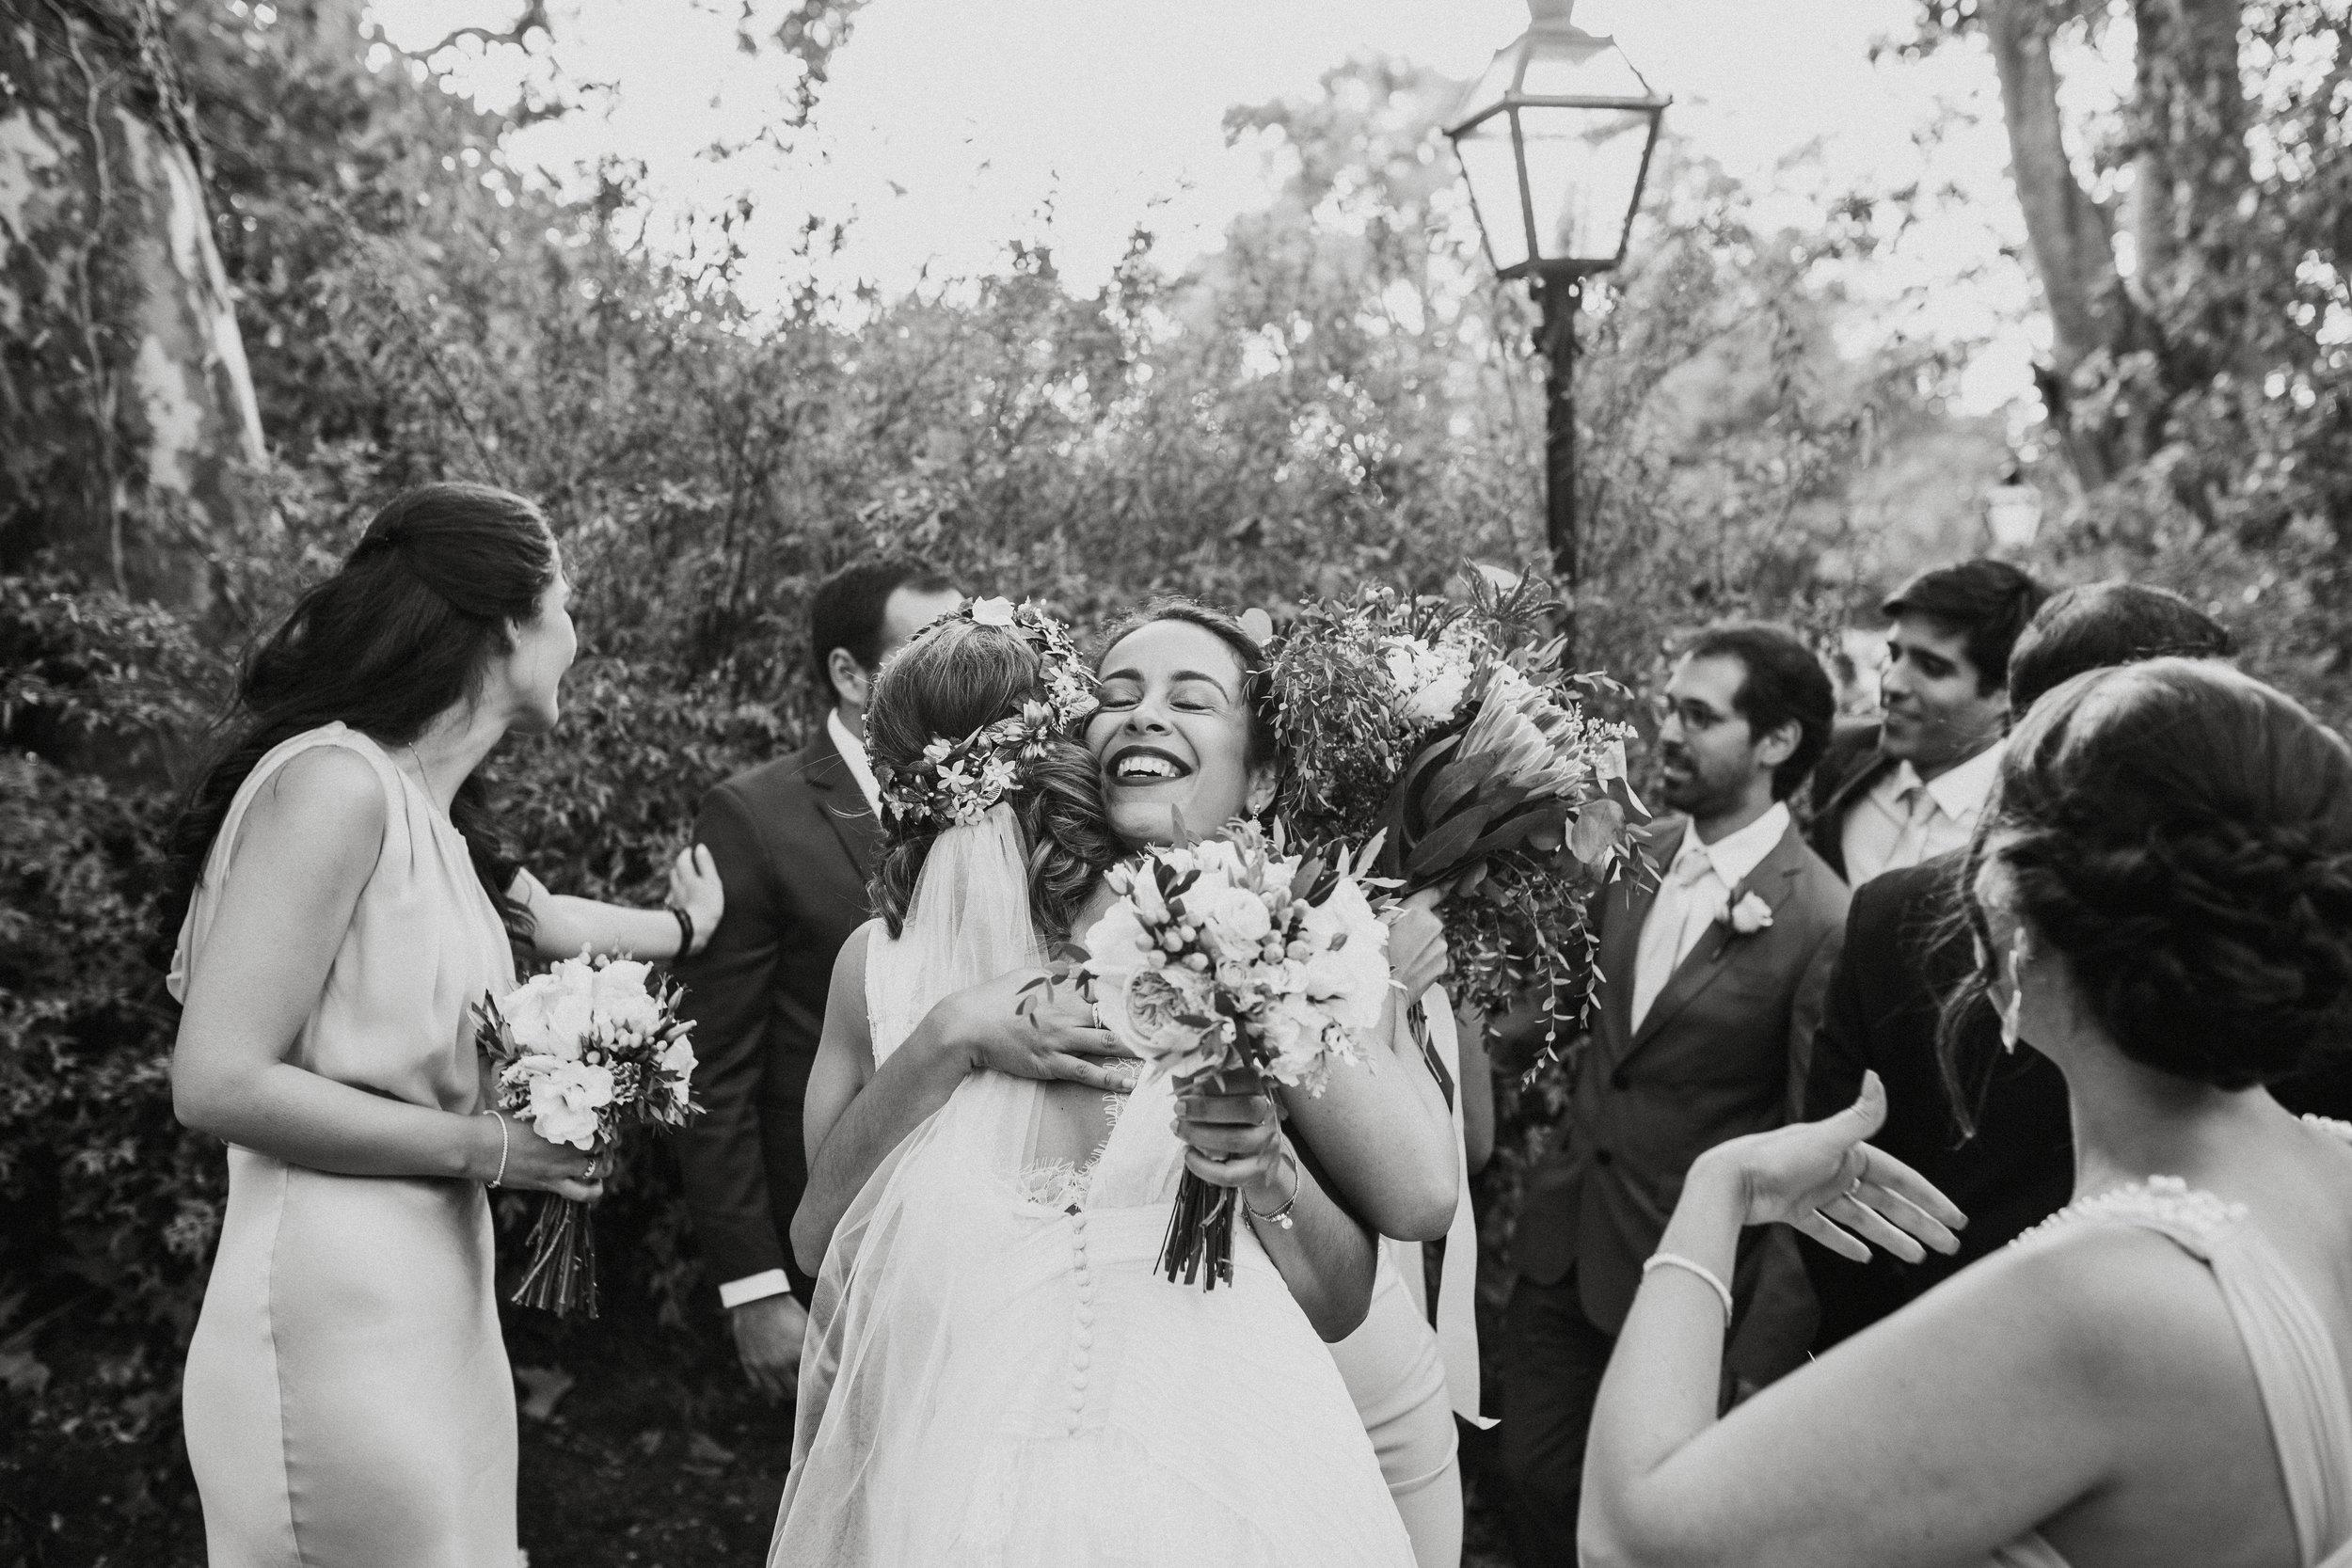 R&J340_ 09 setembro 2017 Wedding day_.jpg